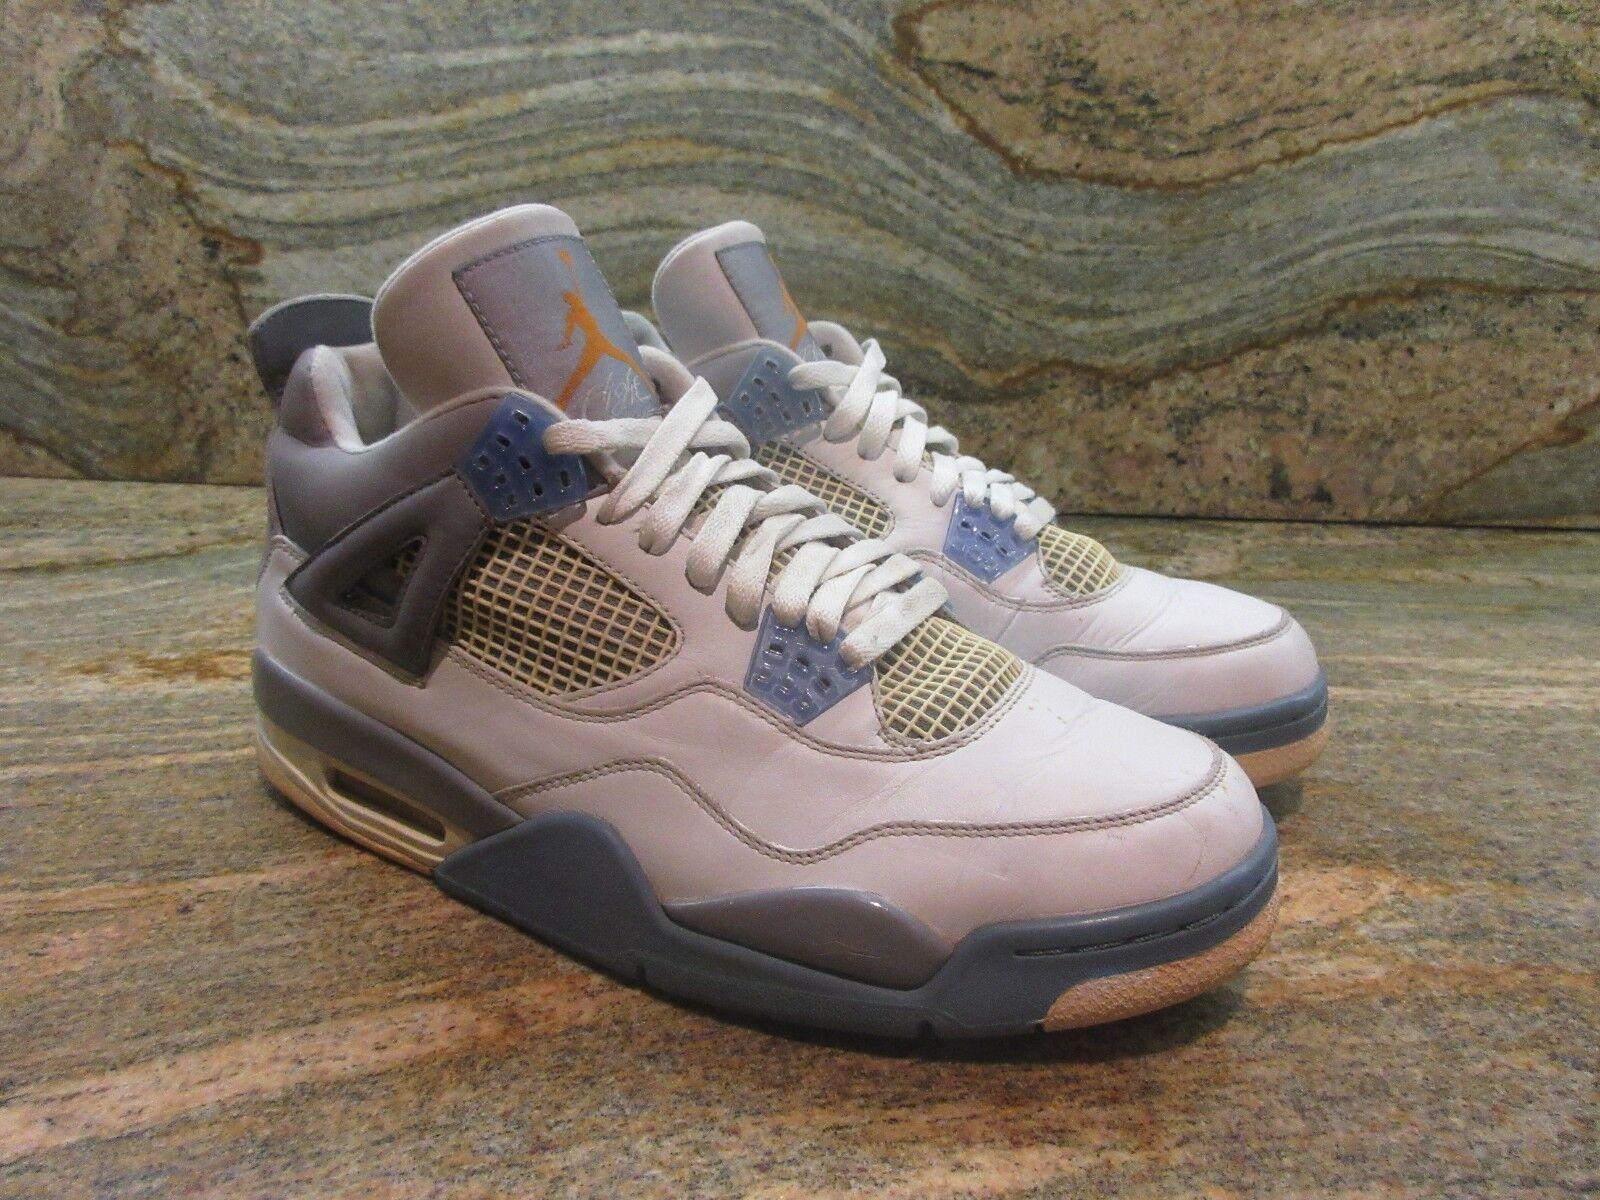 UNRELEASED 2006 Nike Air Jordan Retro Mist 4 Sample SZ 9 Mist Retro Bleu Look See Promo OG ca1fe6